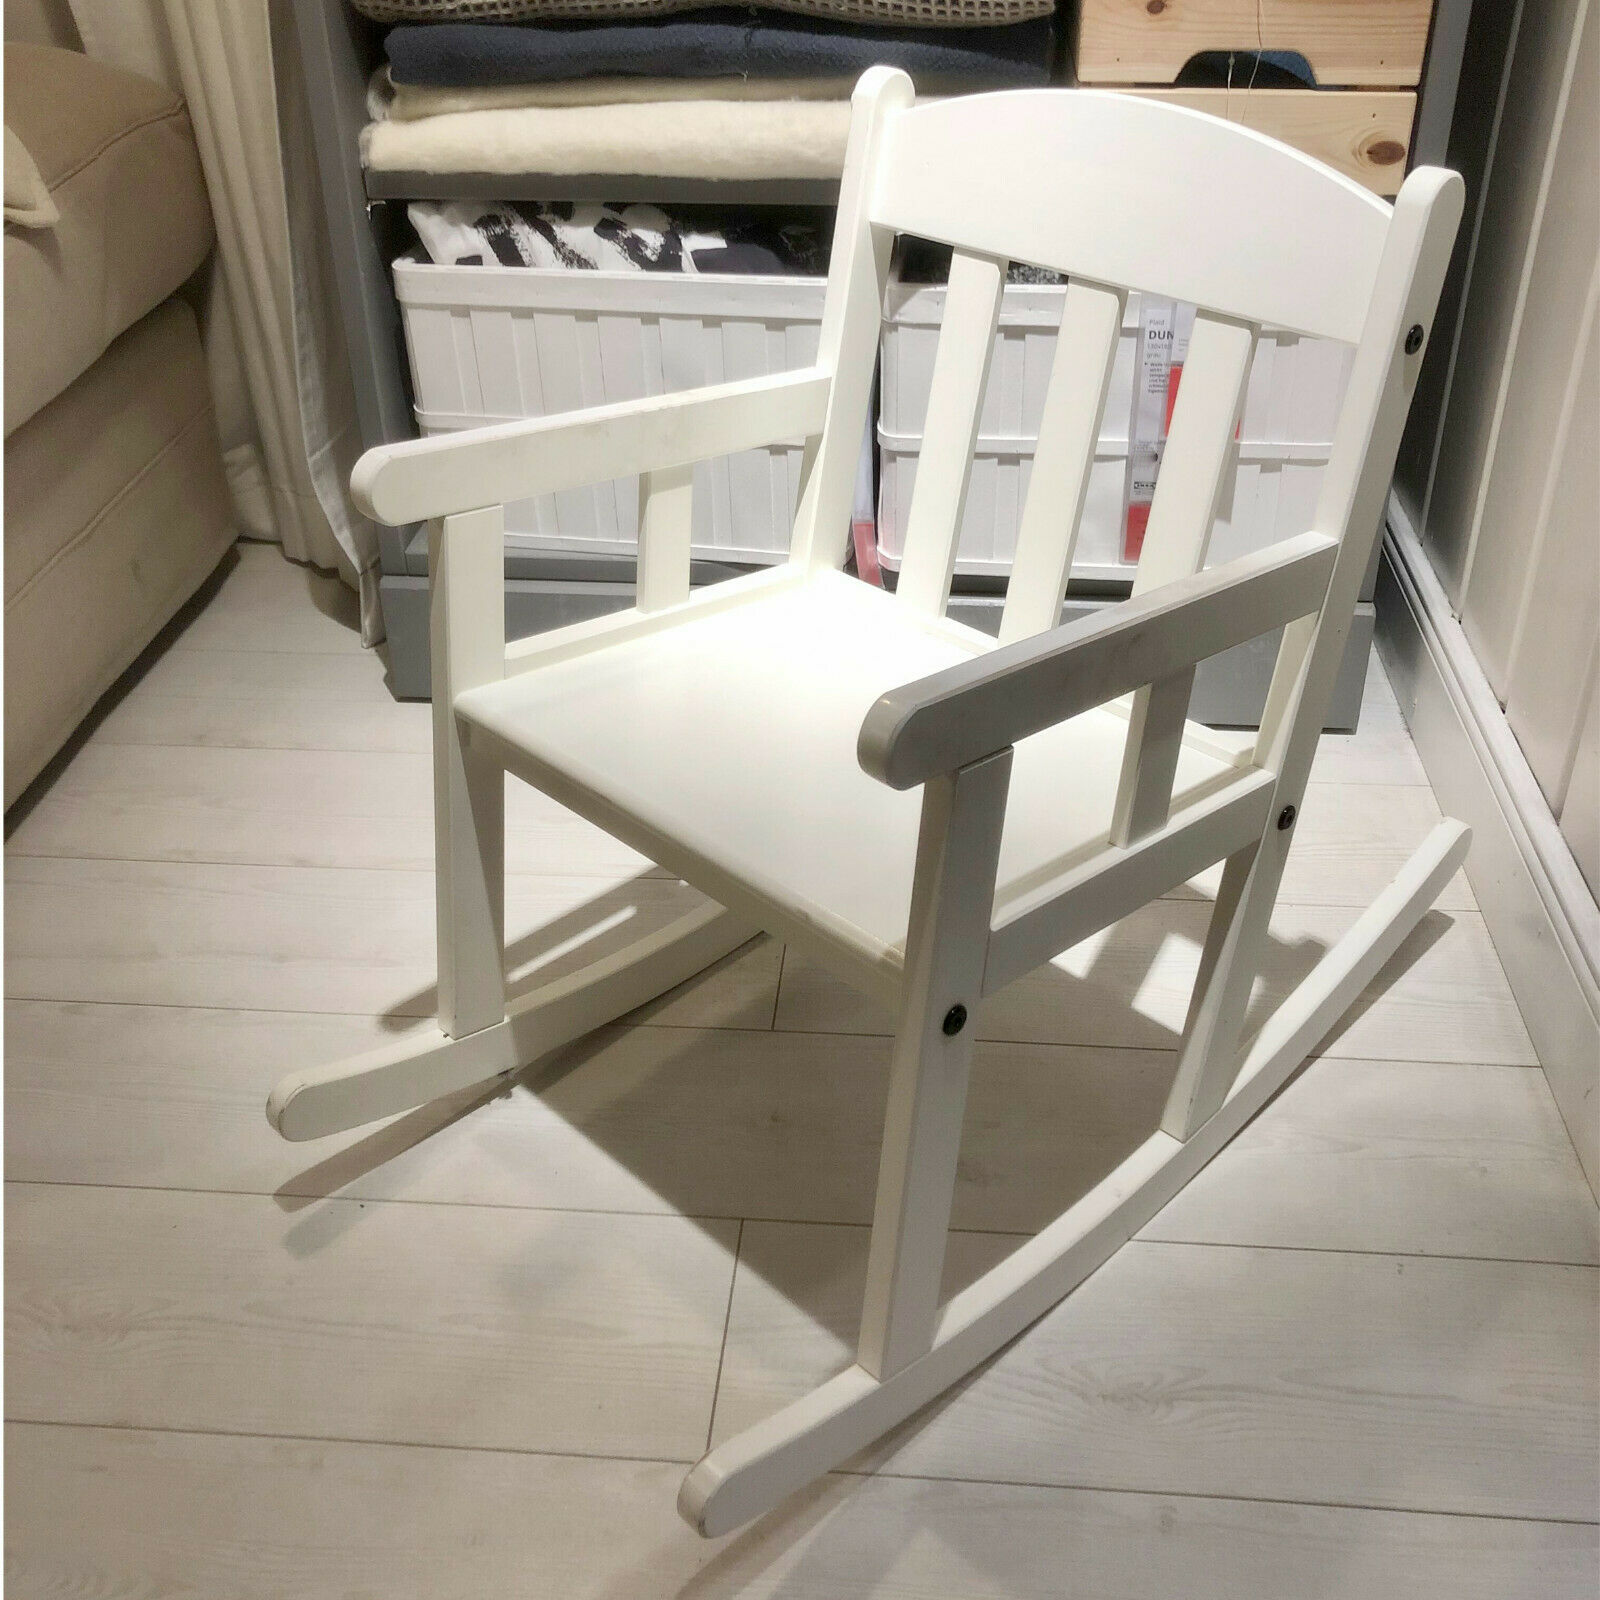 IKEA Kinder Schaukelstuhl in weiß aus Massivholz Wippstuhl Kinderstuhl NEU & OVP